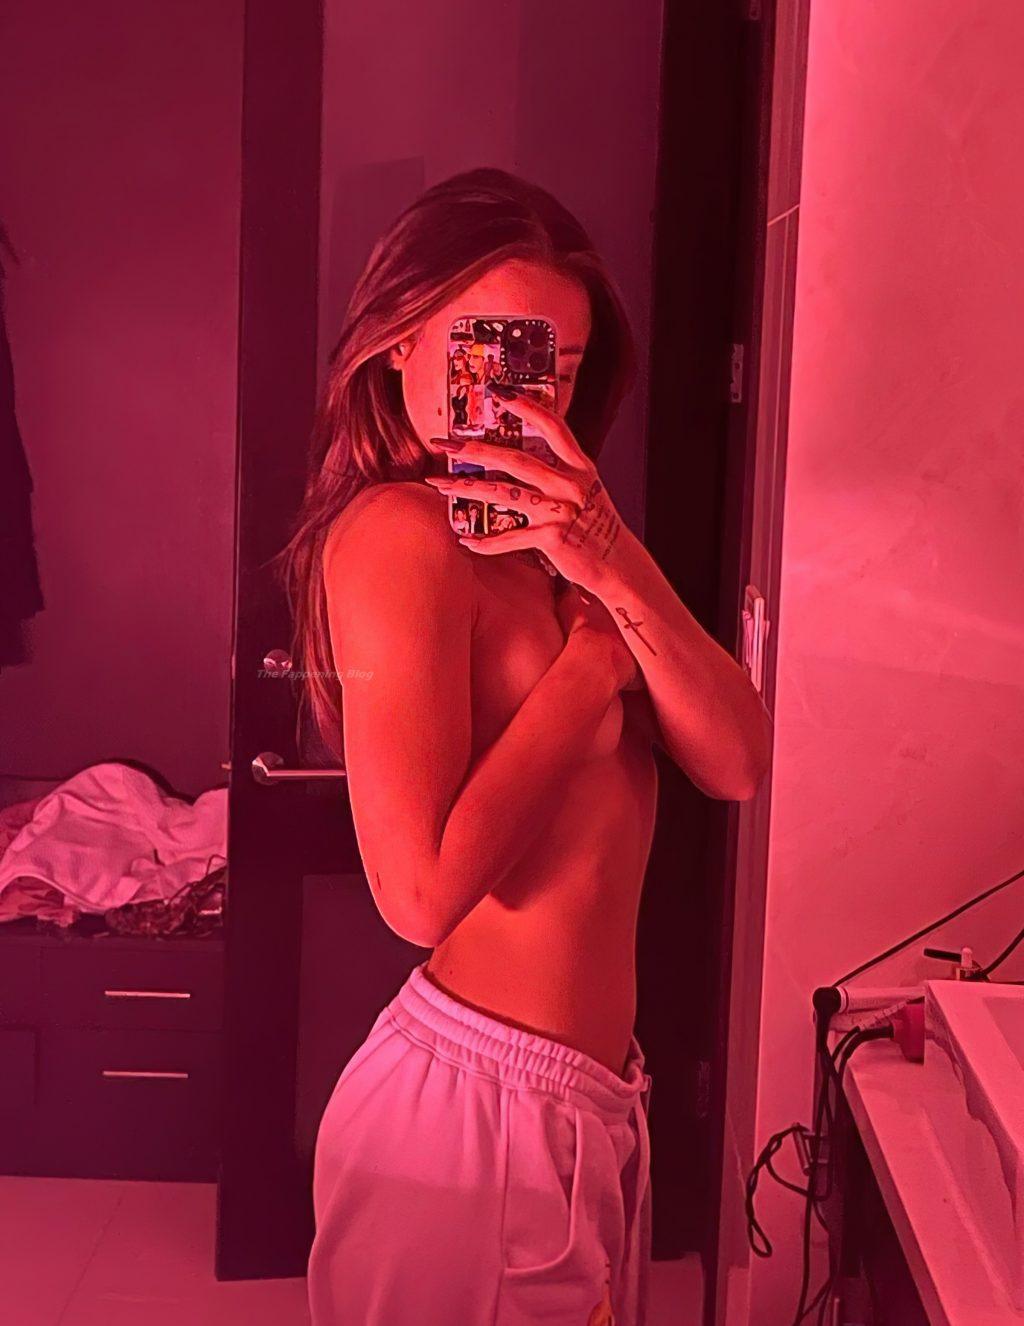 Charly Jordan Topless (3 New Photos)